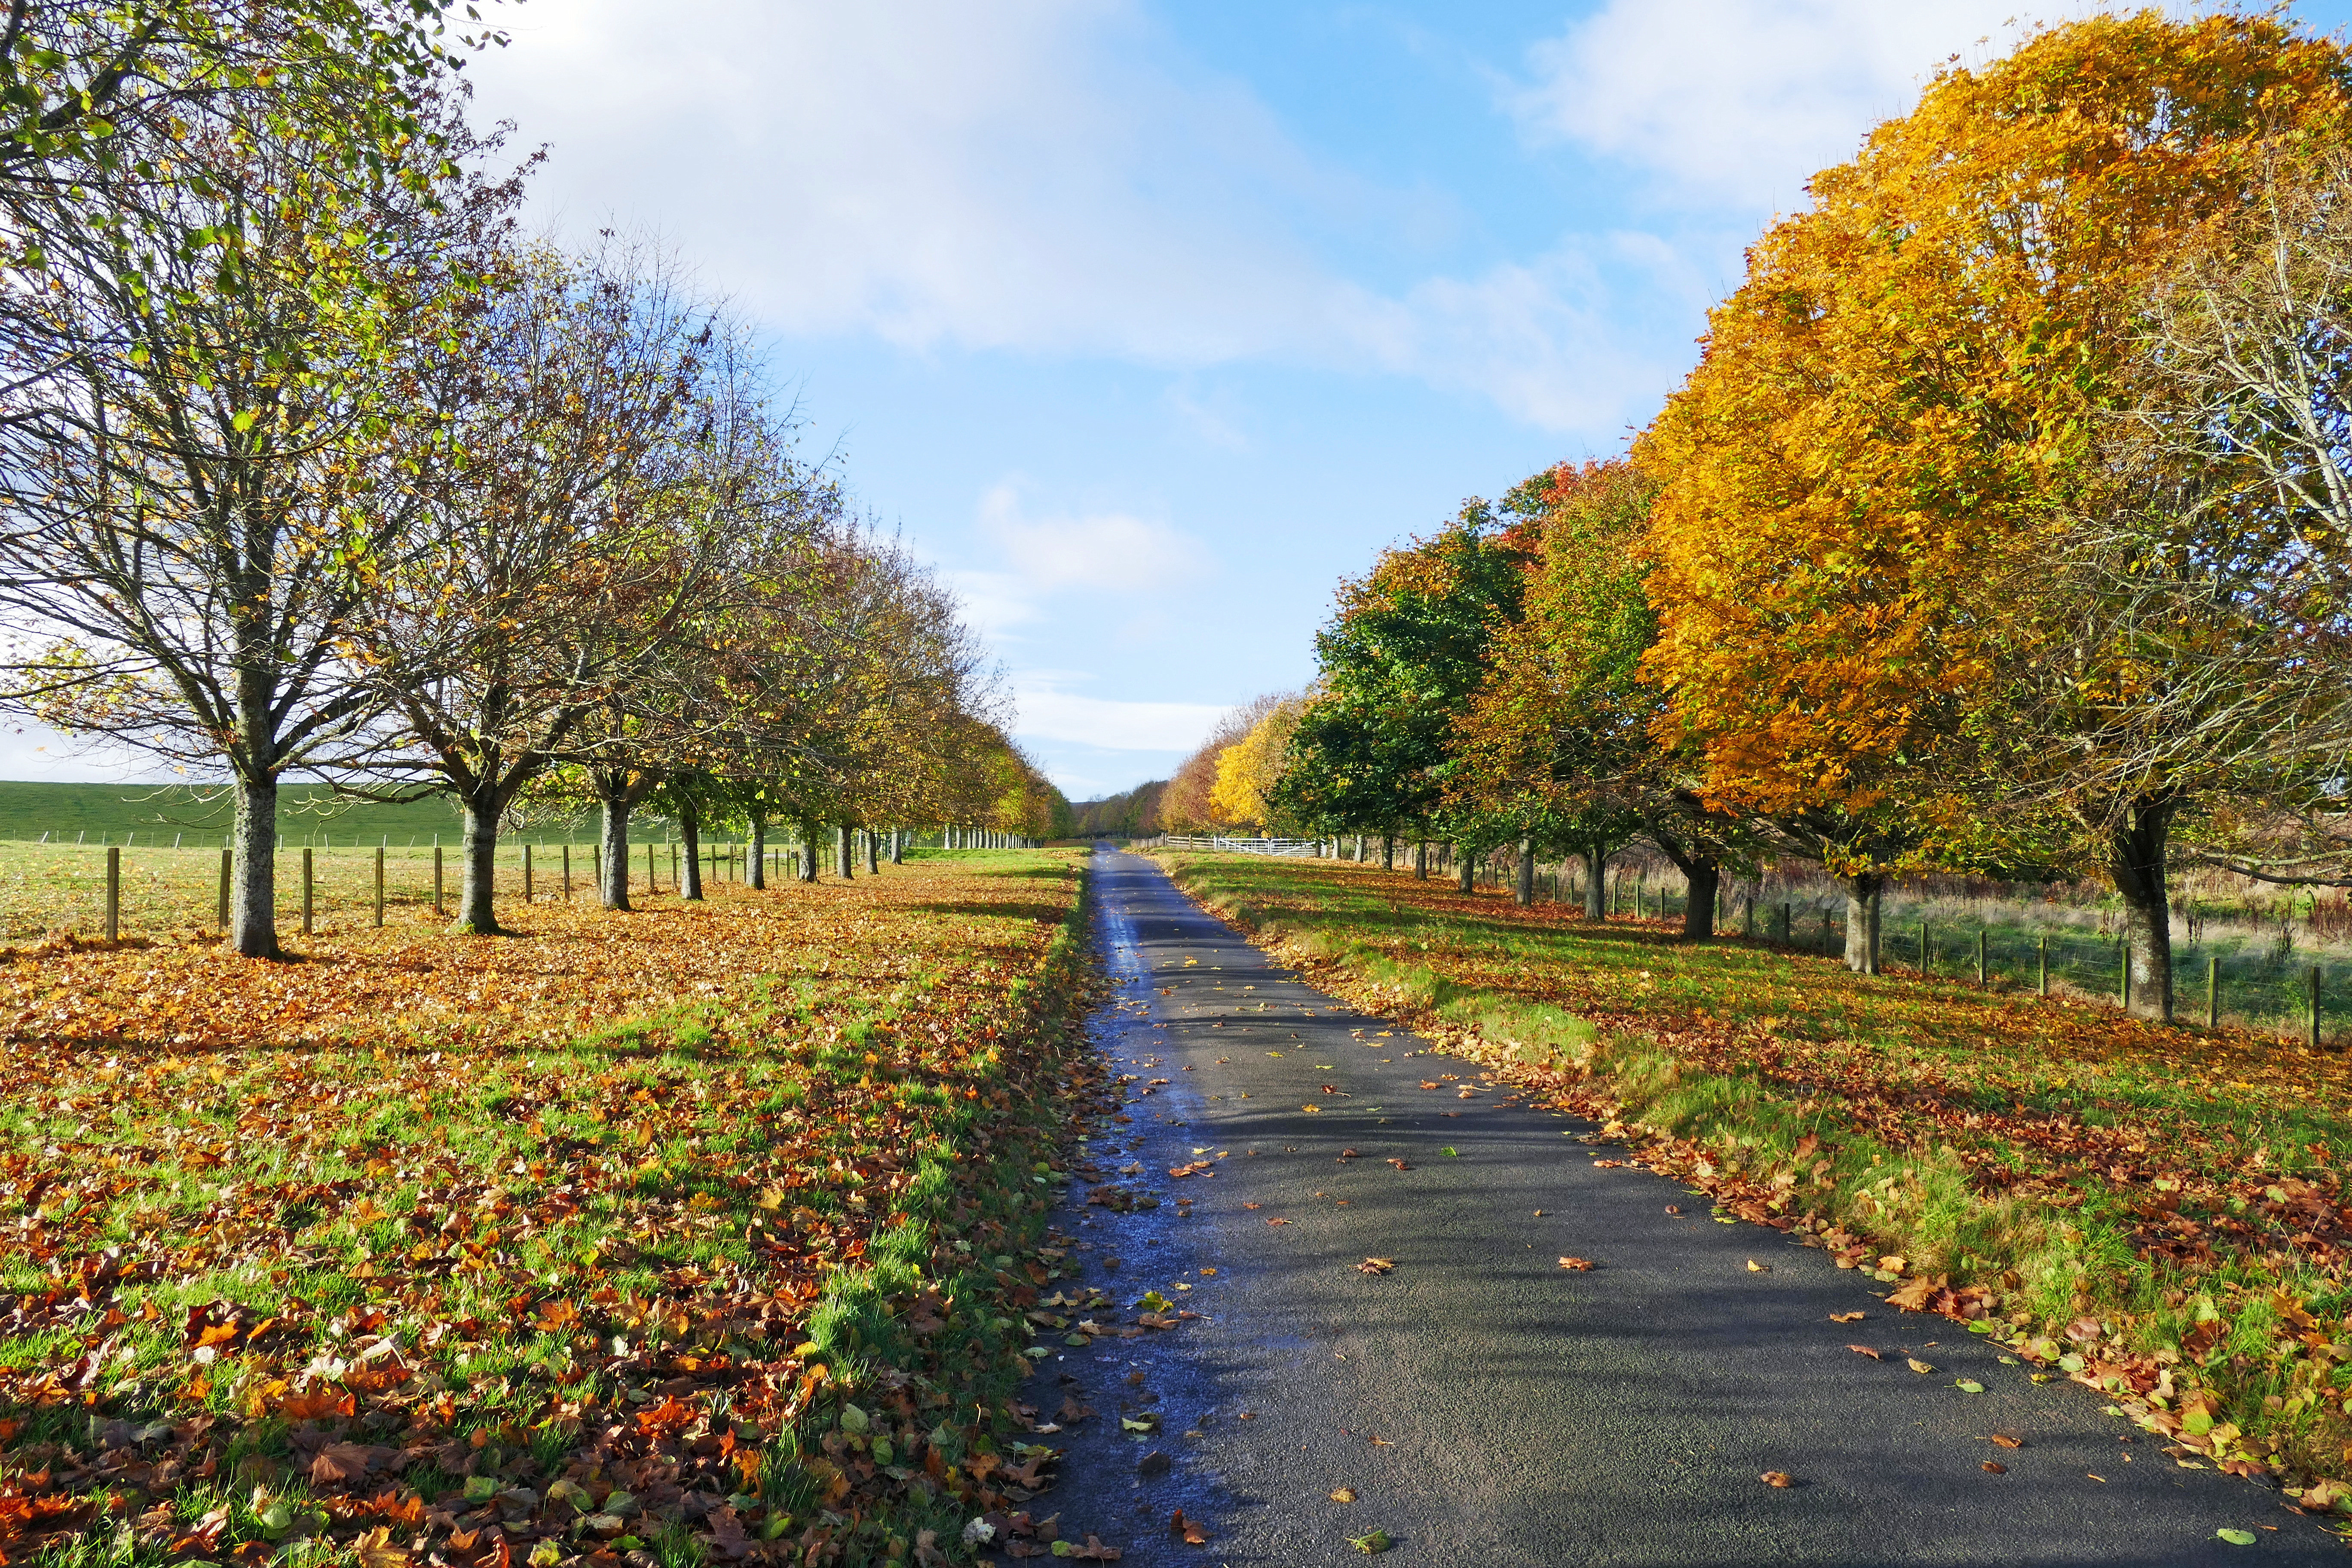 обои осень, дорога, поле, деревья картинки фото